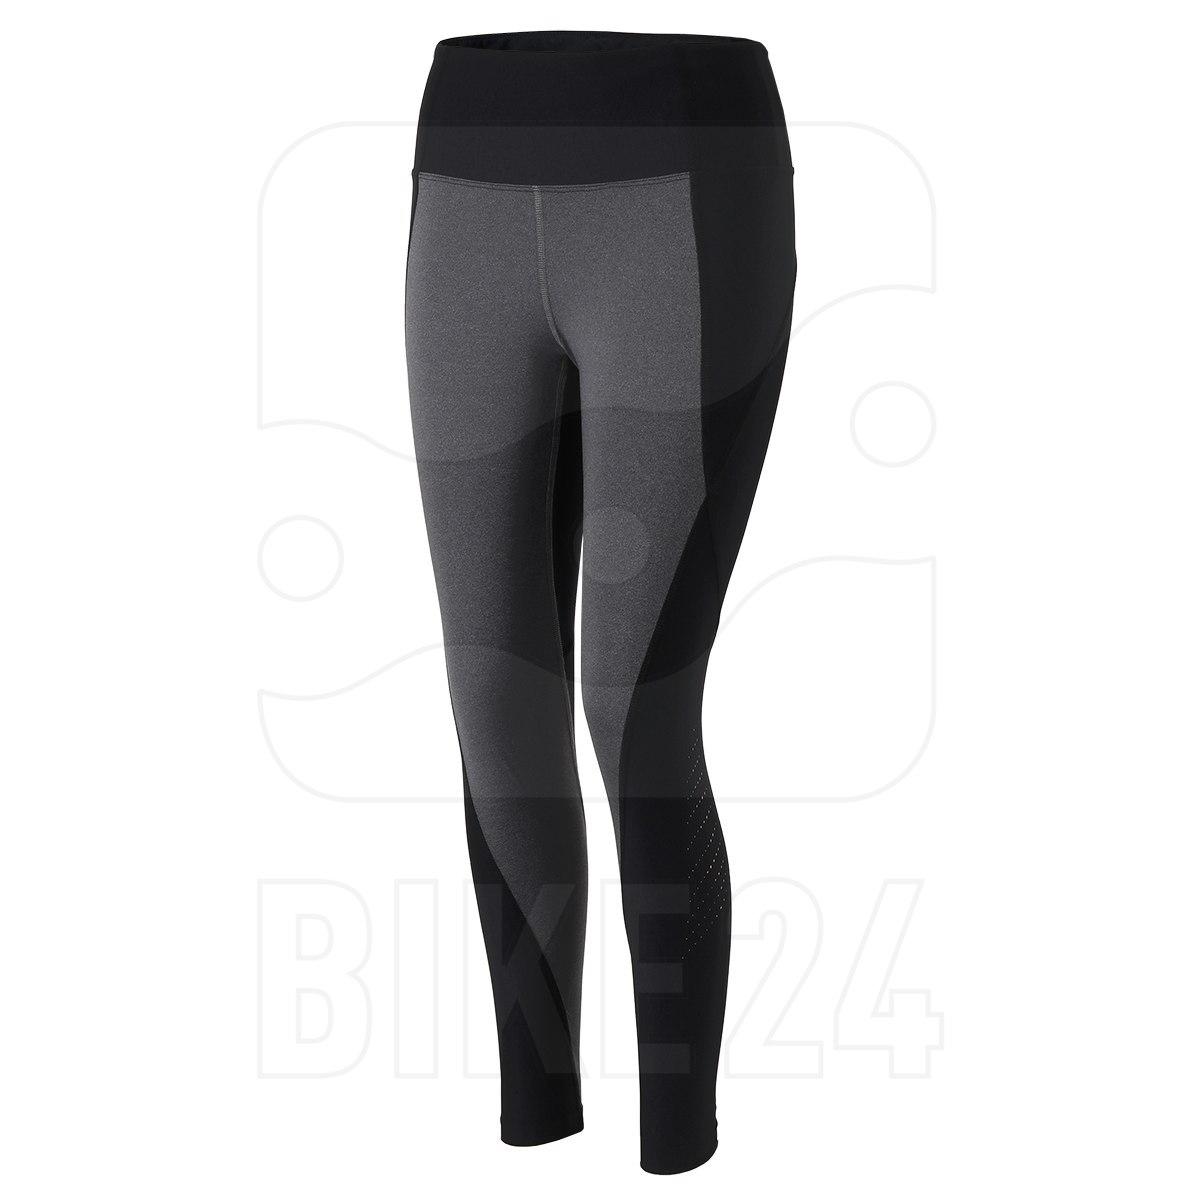 Marika Josie Lasercut Ankle Legging Women - heather grey/black